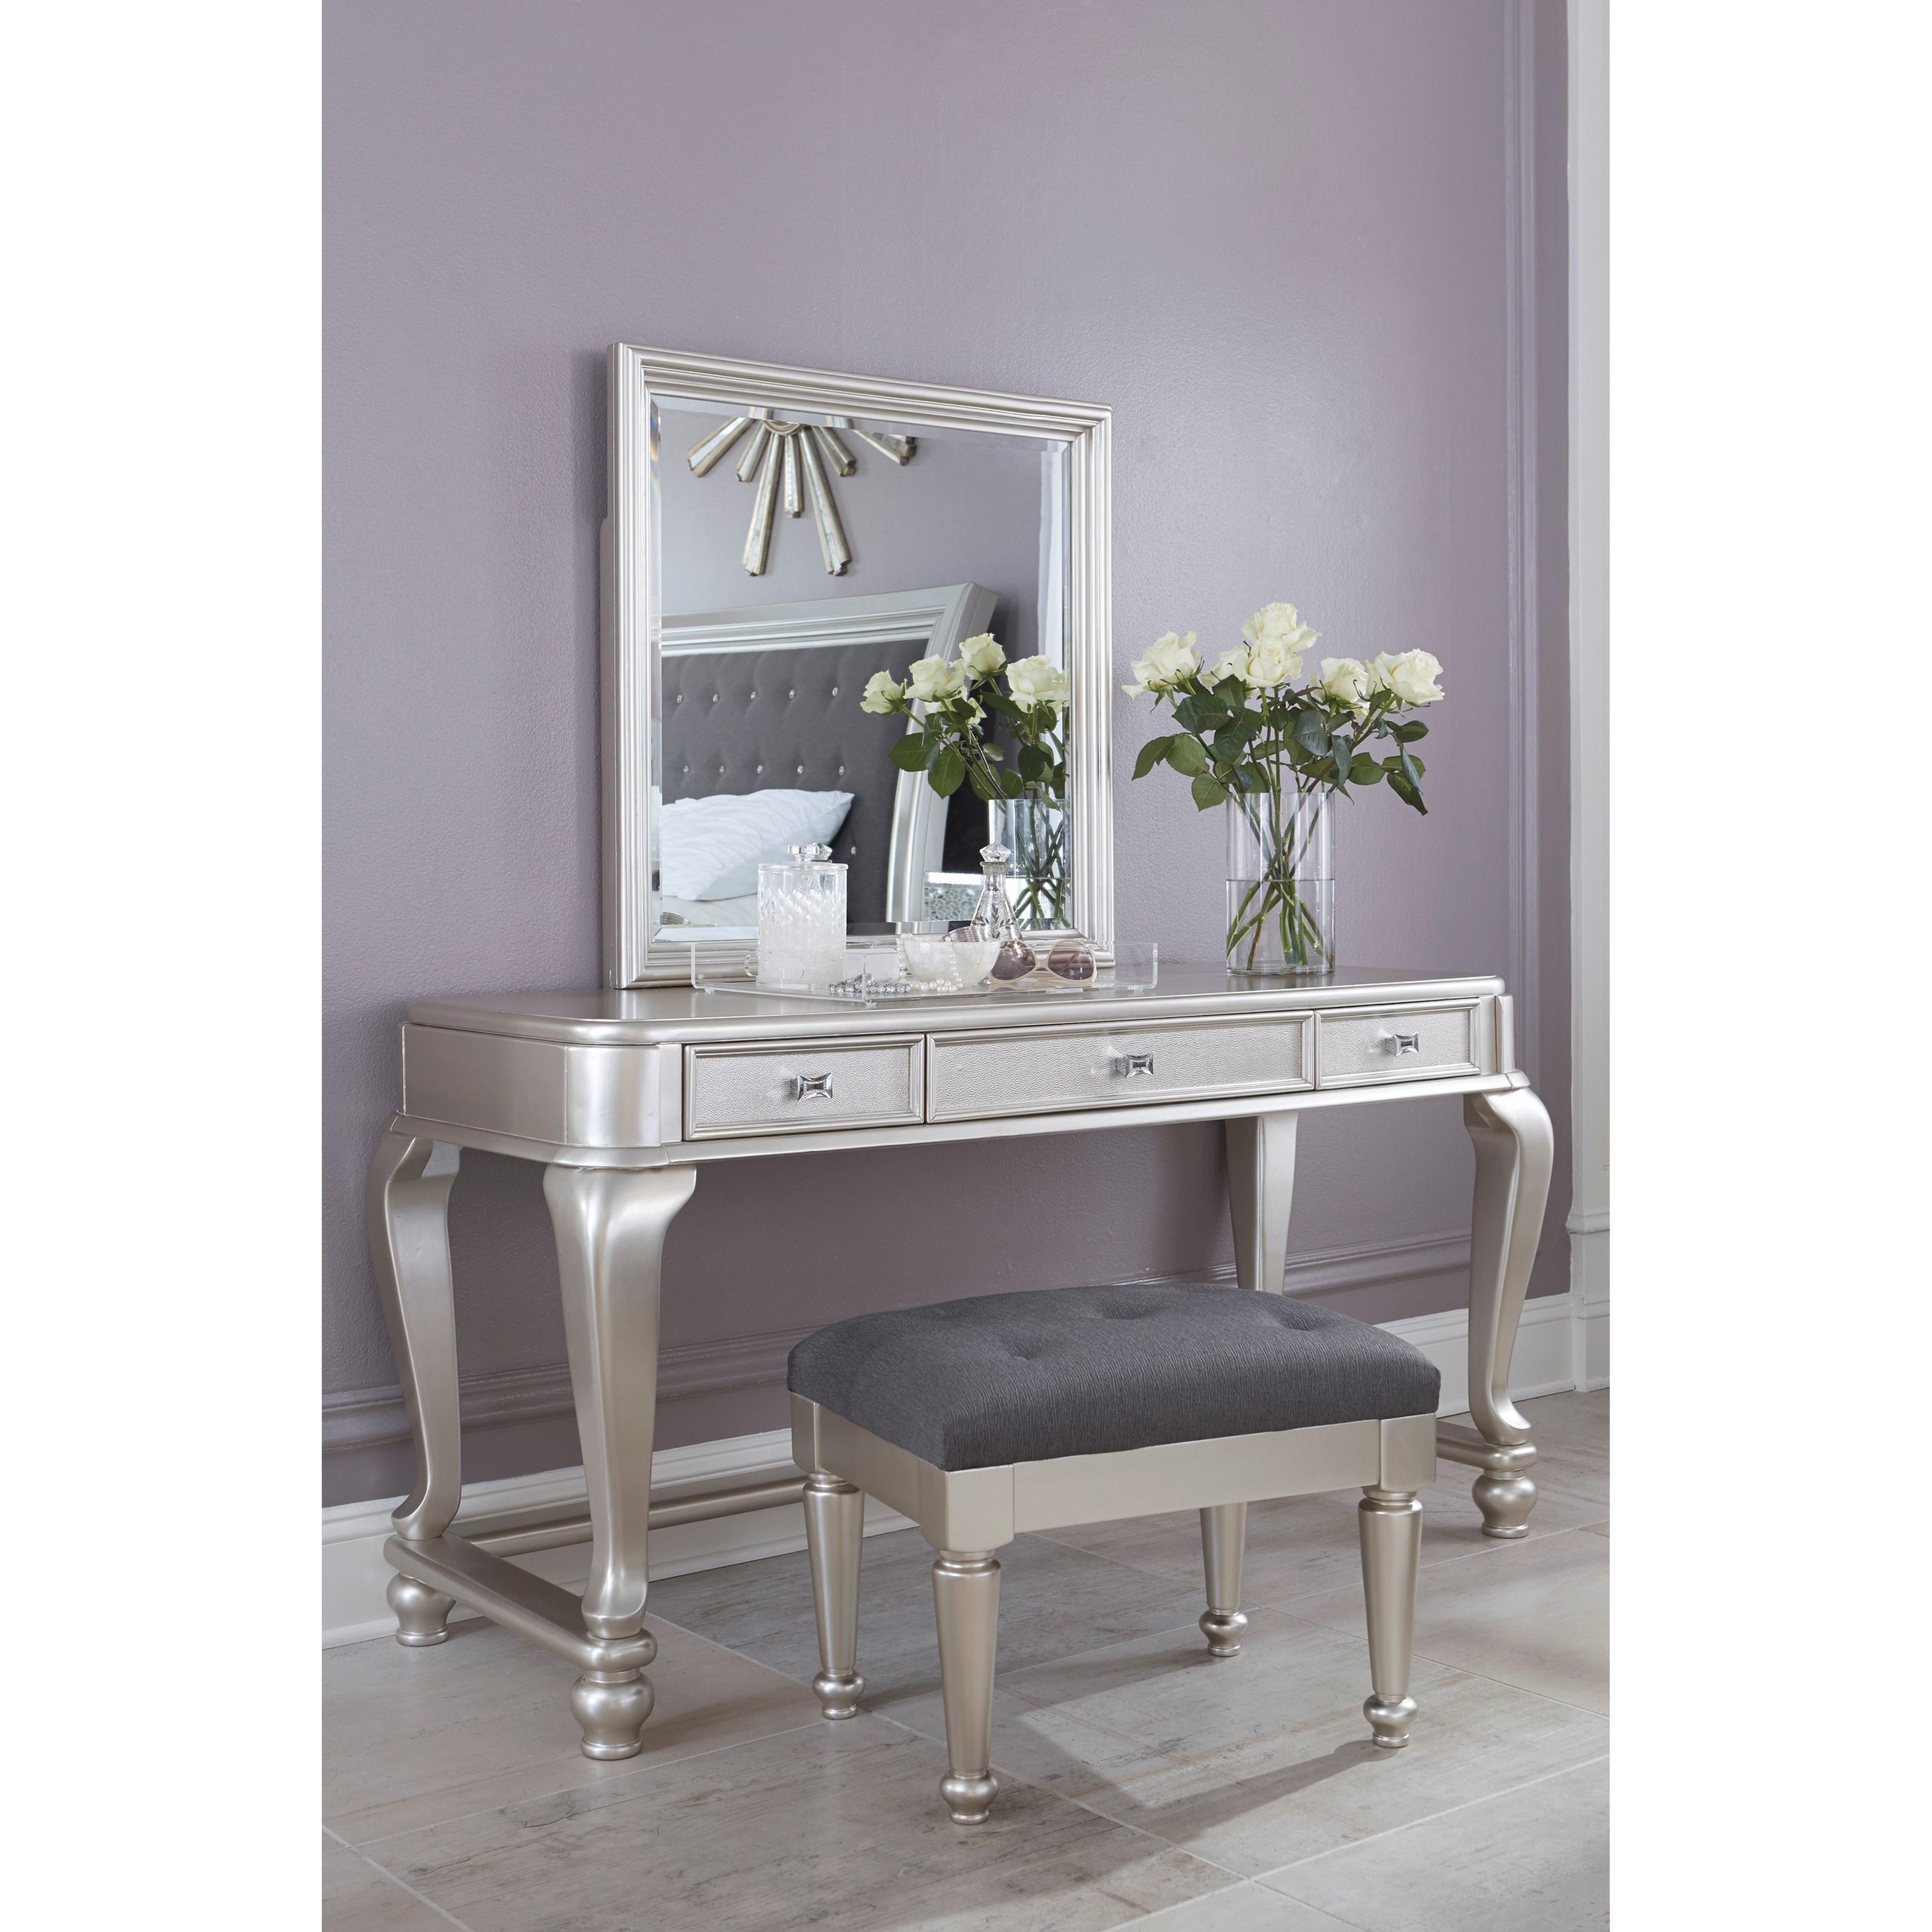 Signature Design By Ashley Coralayne B650-22 Vanity Desk